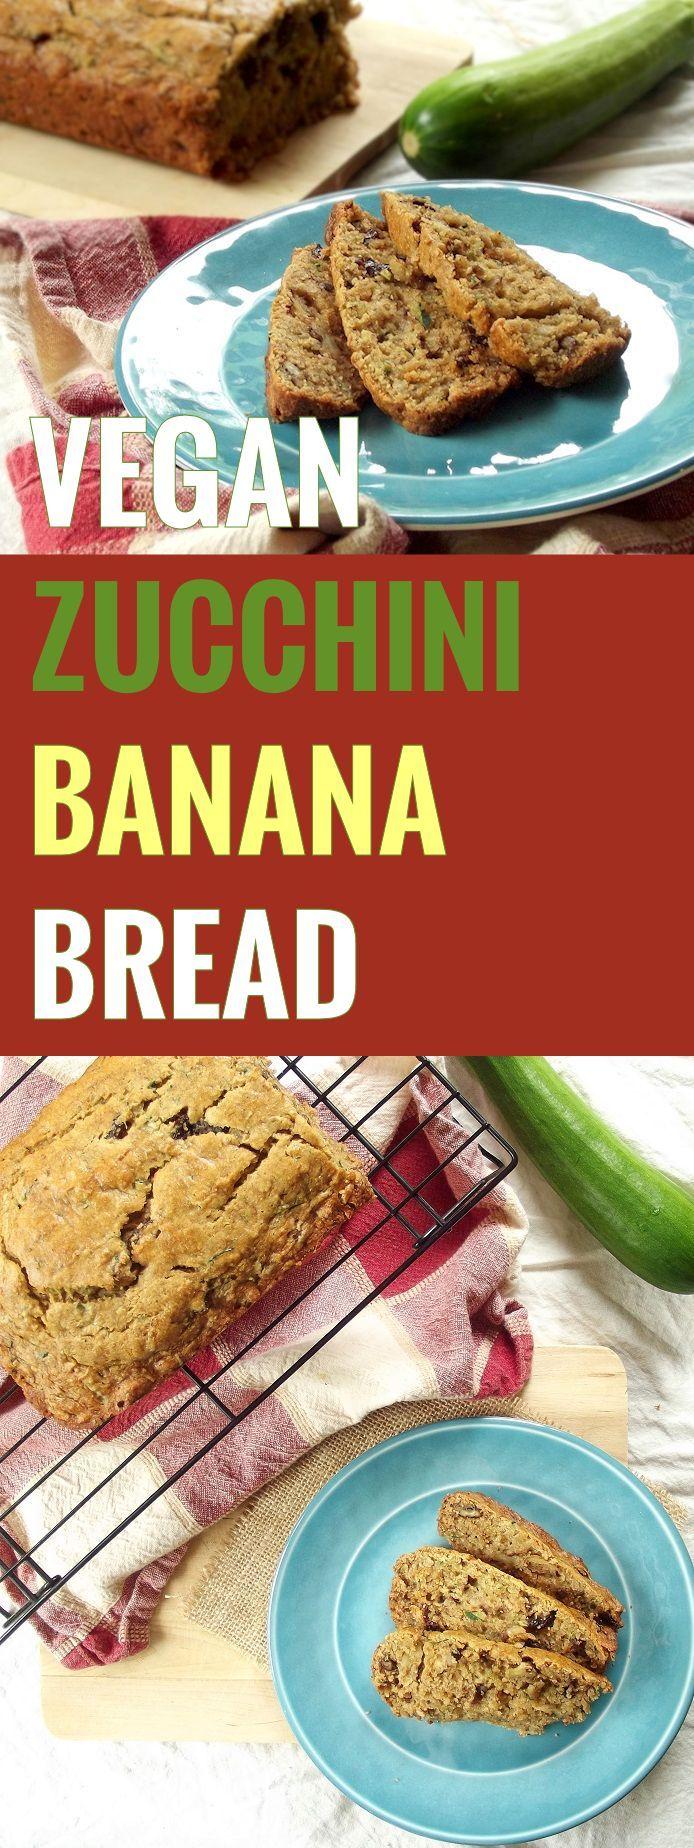 Vegan Zucchini Banana Bread Connoisseurus Veg Zucchini Banana Bread Vegan Zucchini Bread Vegan Zucchini